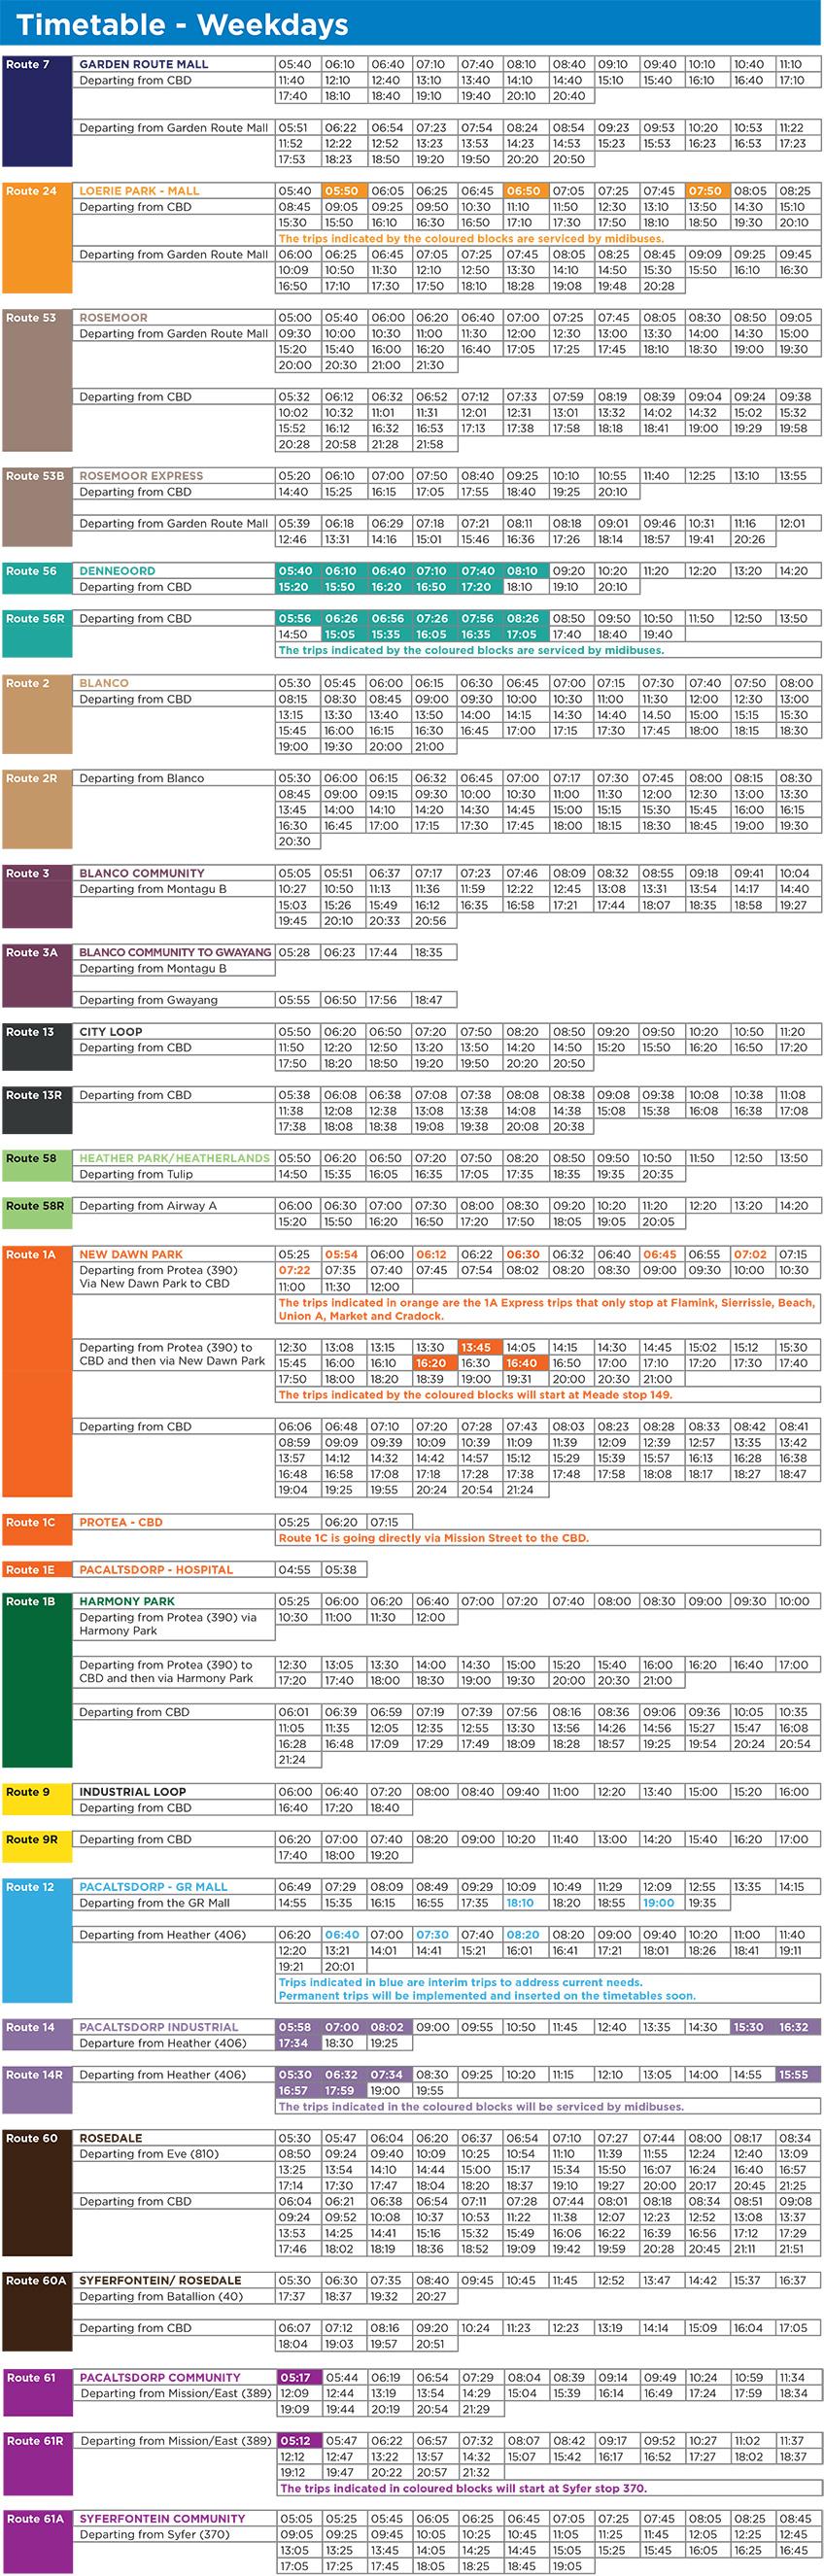 Timetable Weekdays